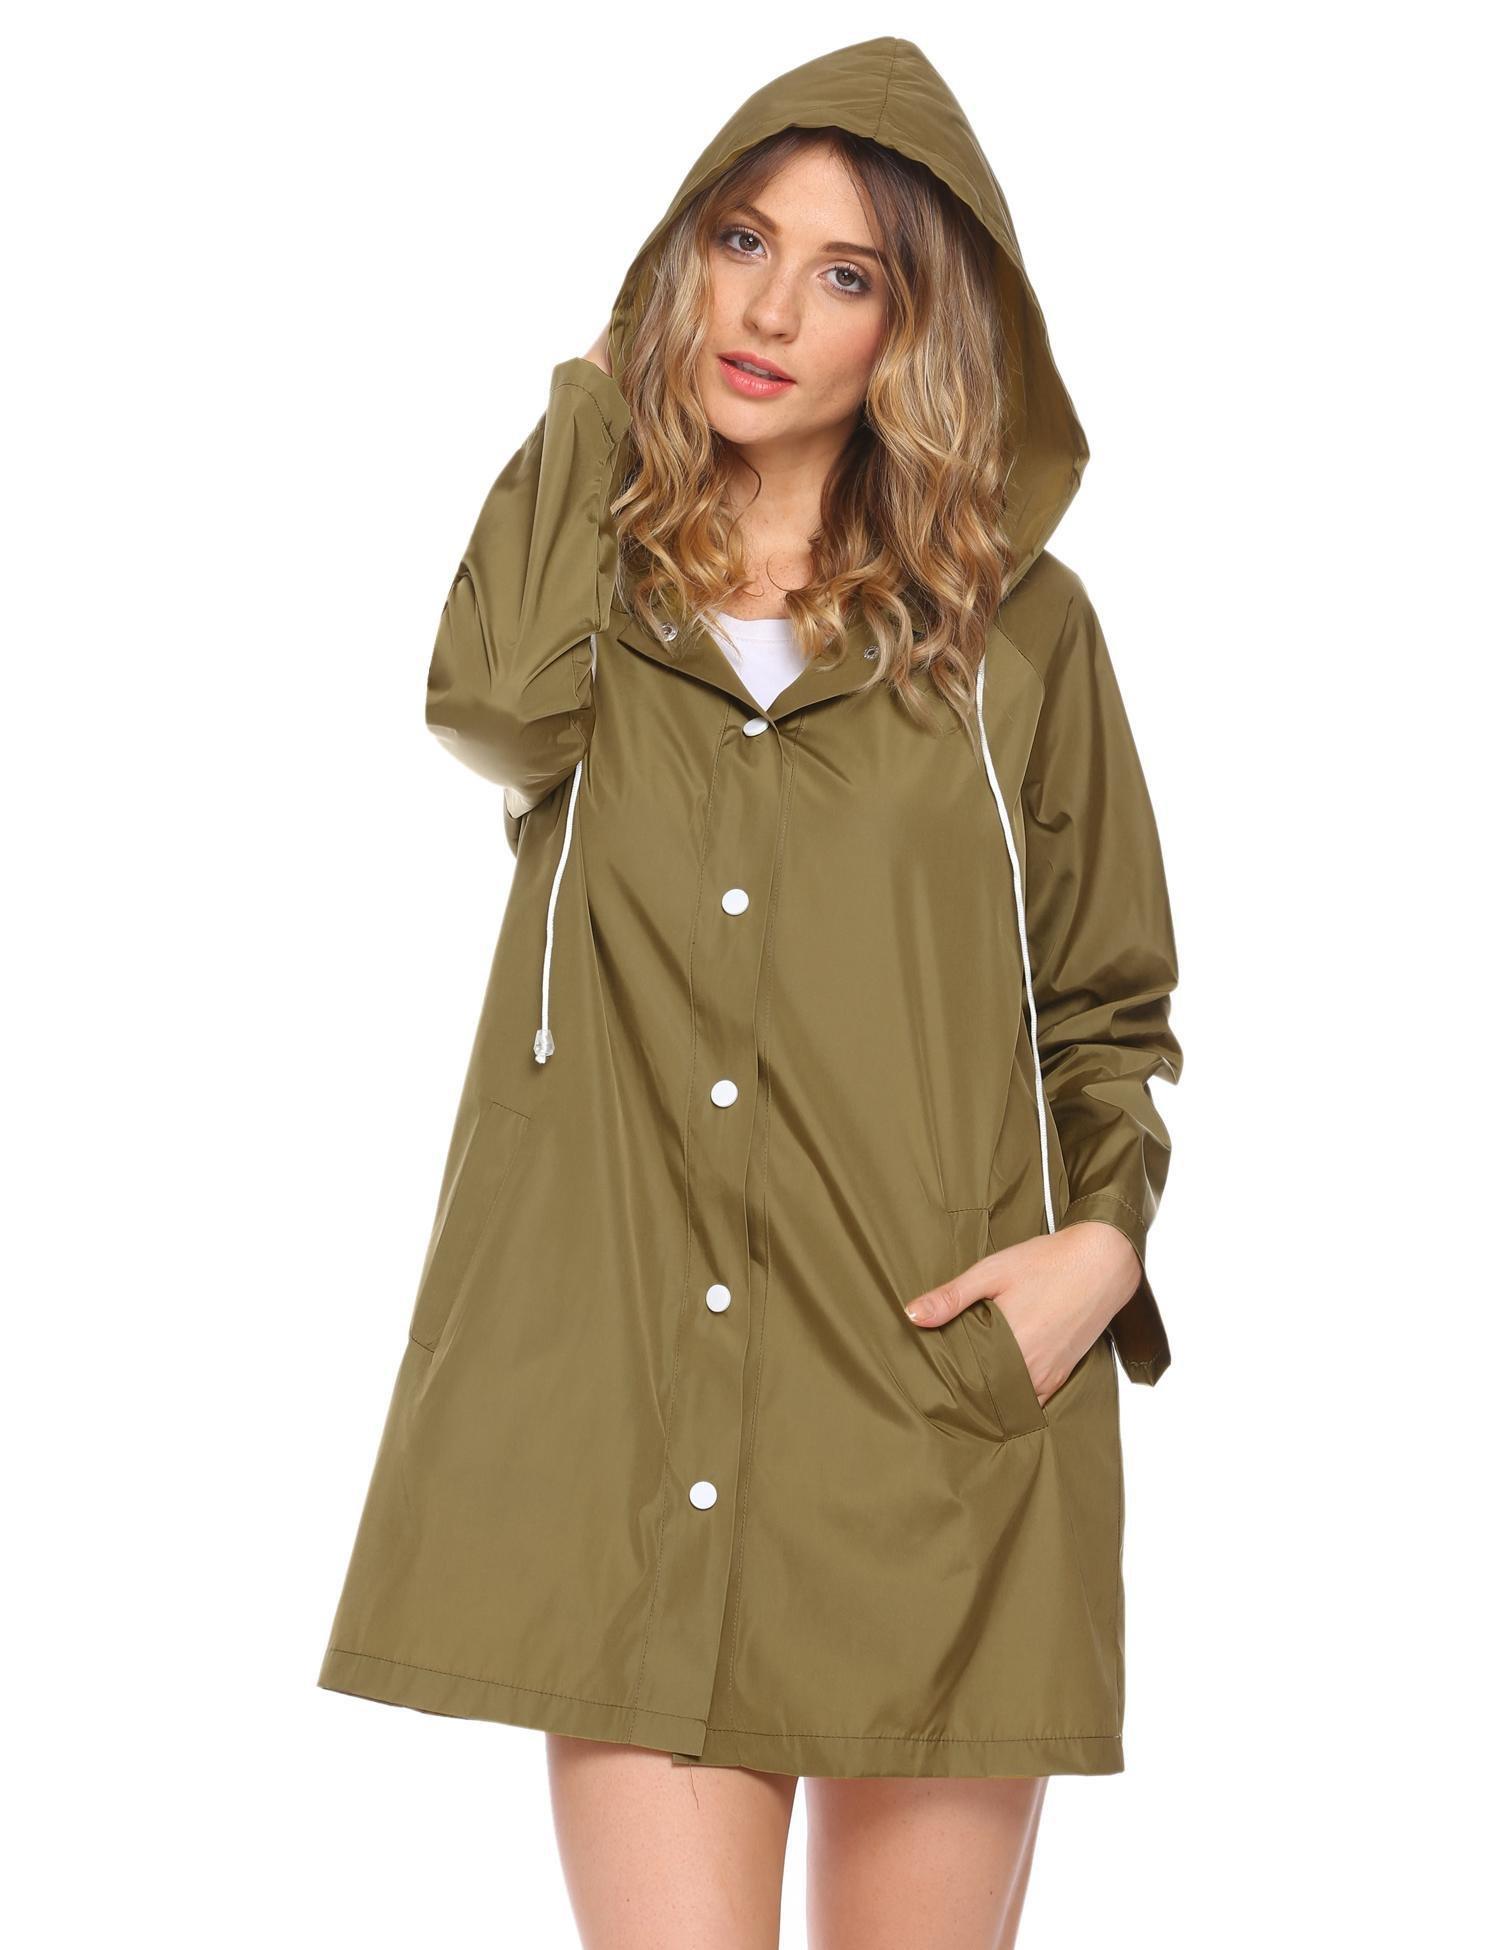 SUNAELIA Women's Raincoat Lightweight Waterproof Rain Coat with Hood Long Rain Jacket Windbreaker